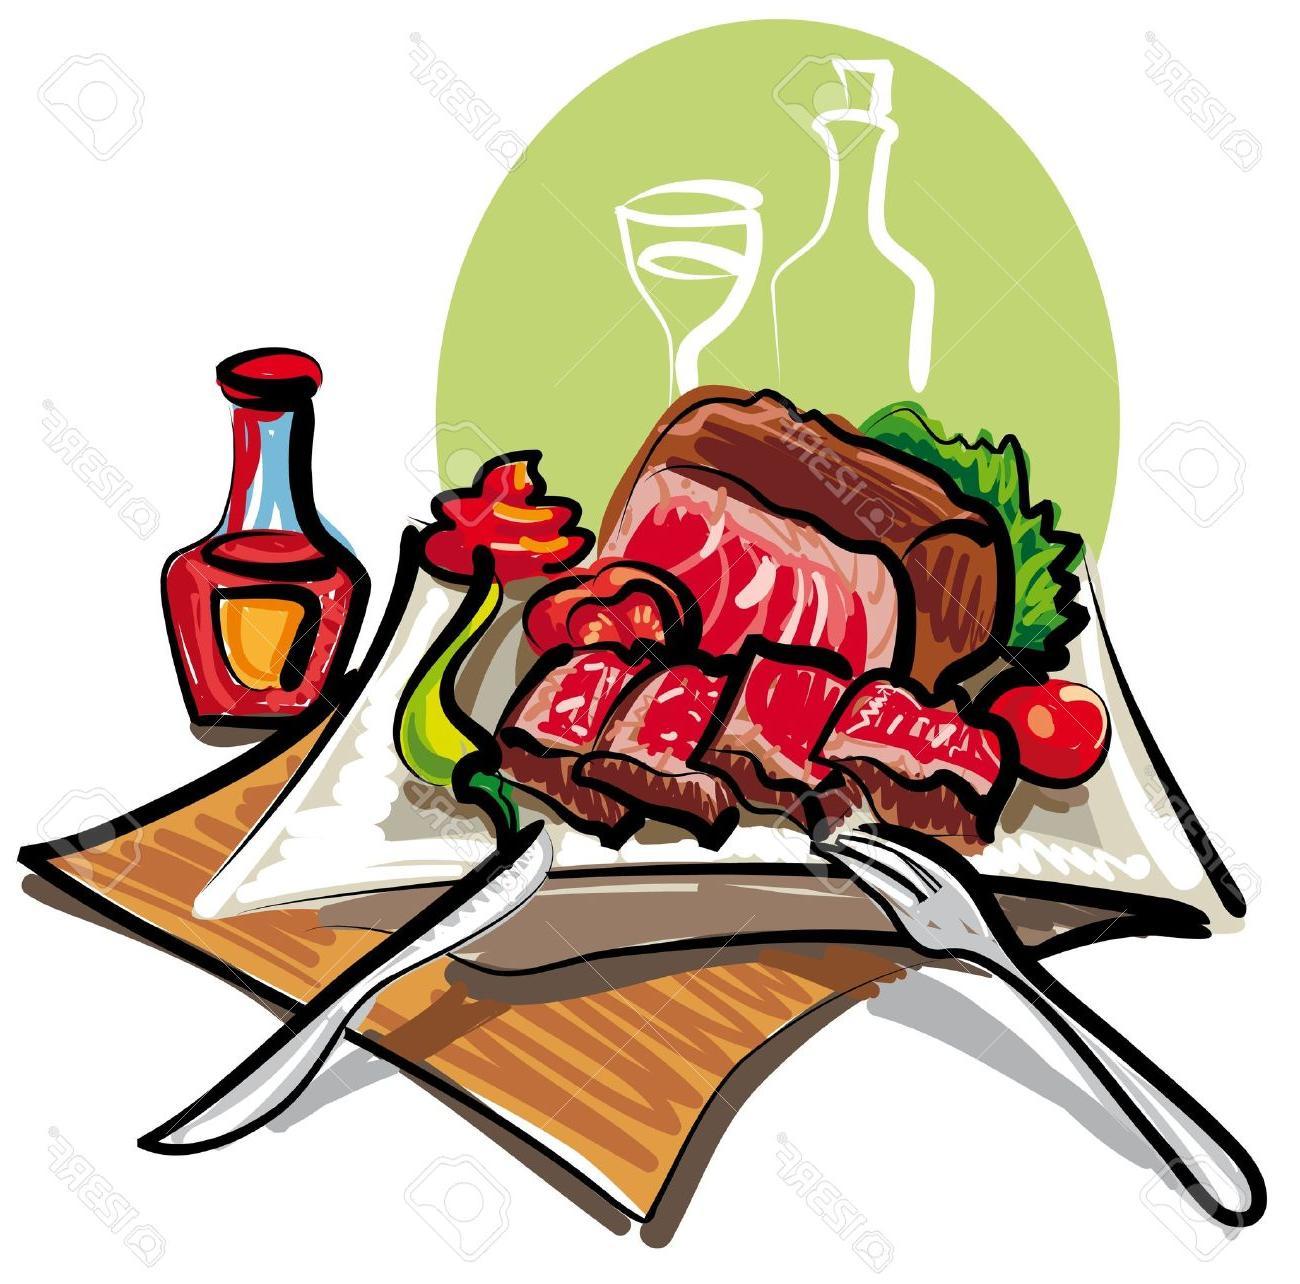 Clipart steak dinner royalty free Best Steak Dinner Vector File Free » Free Vector Art, Images ... royalty free